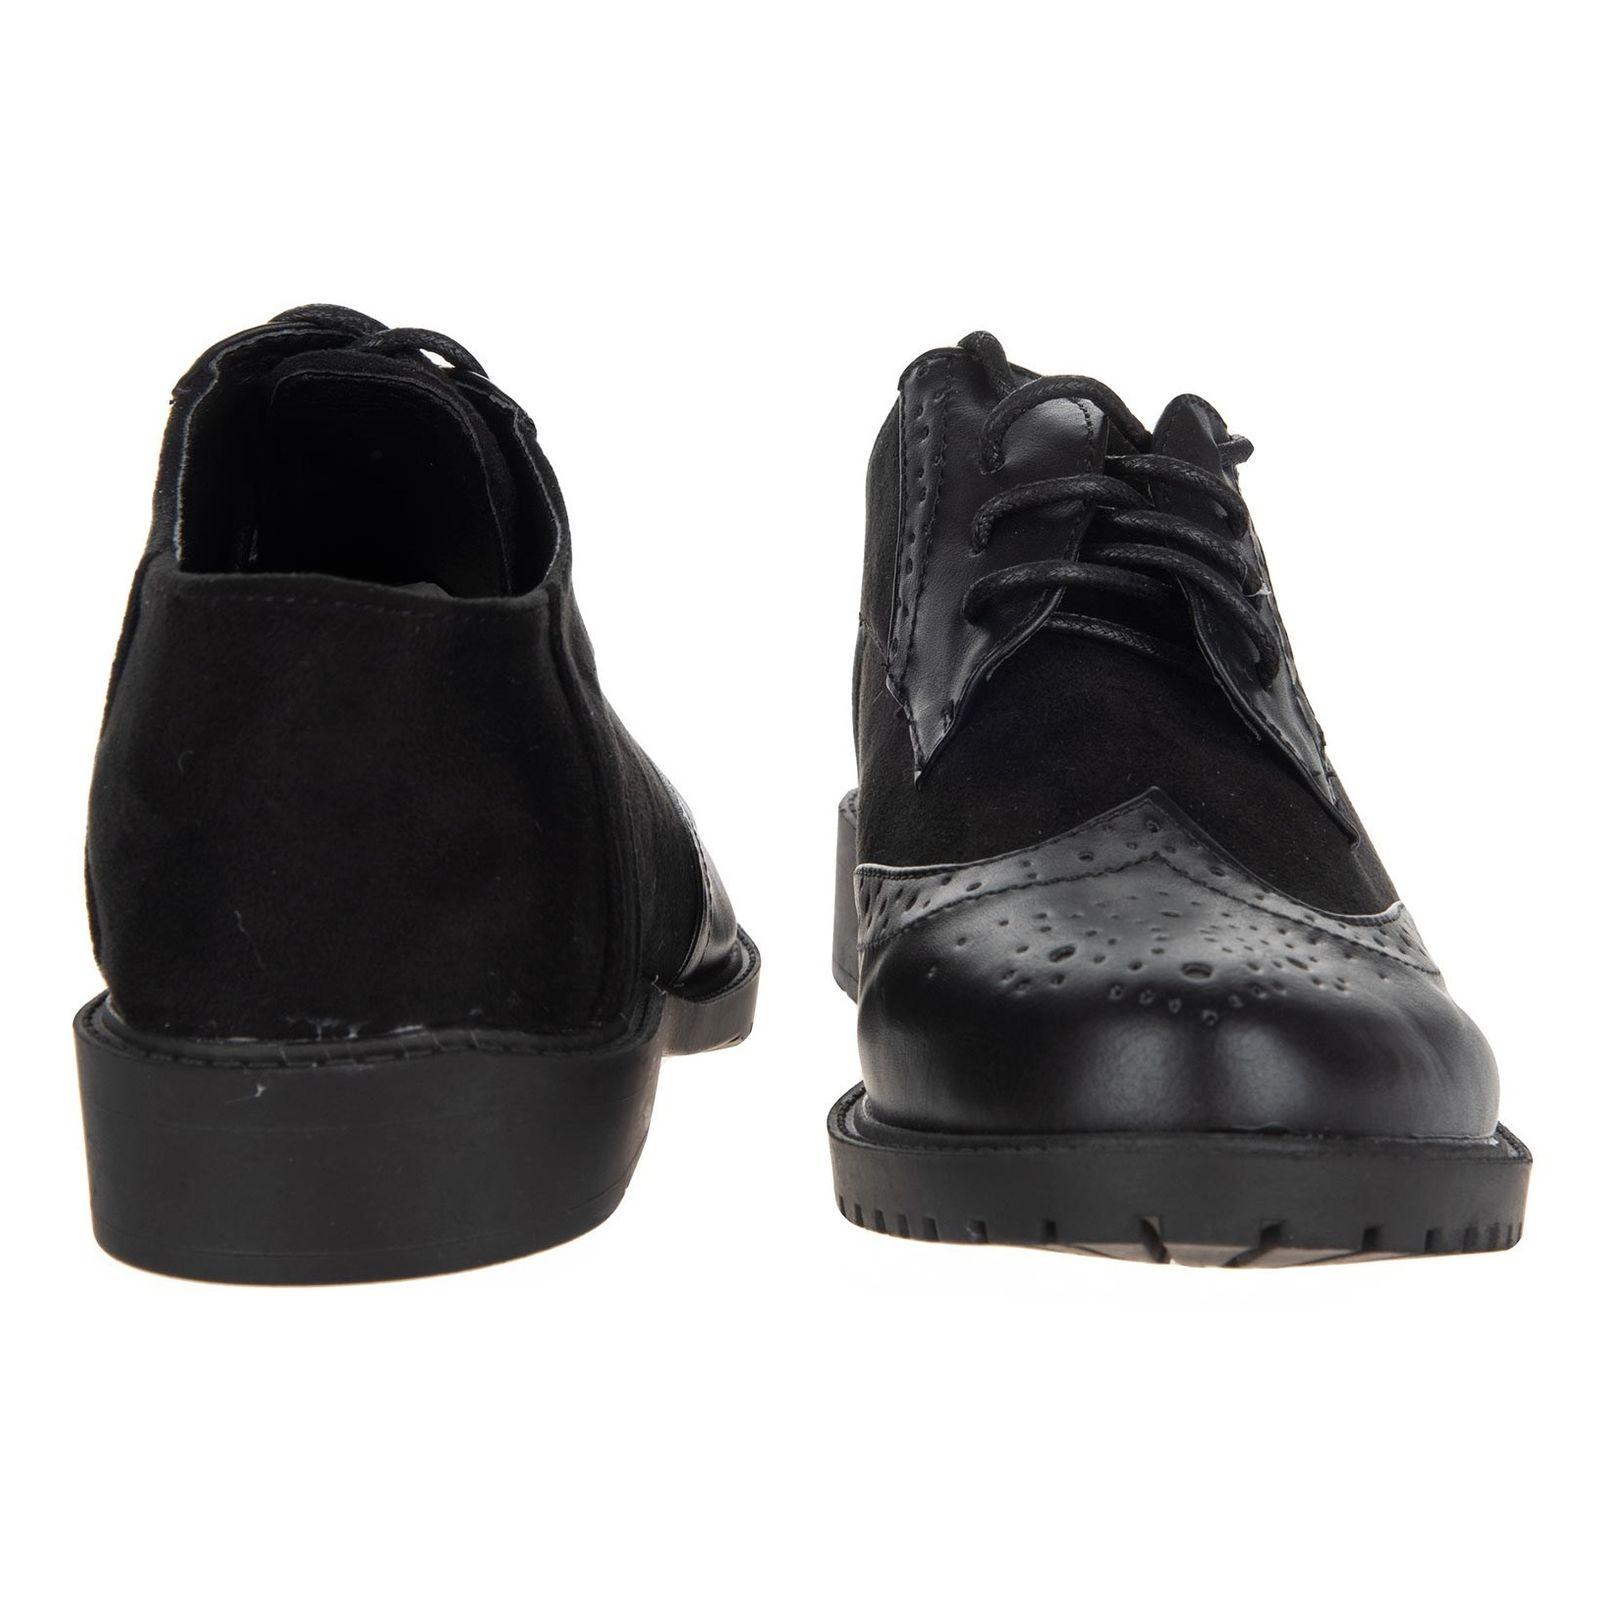 کفش تخت زنانه - مالین - مشکی - 4